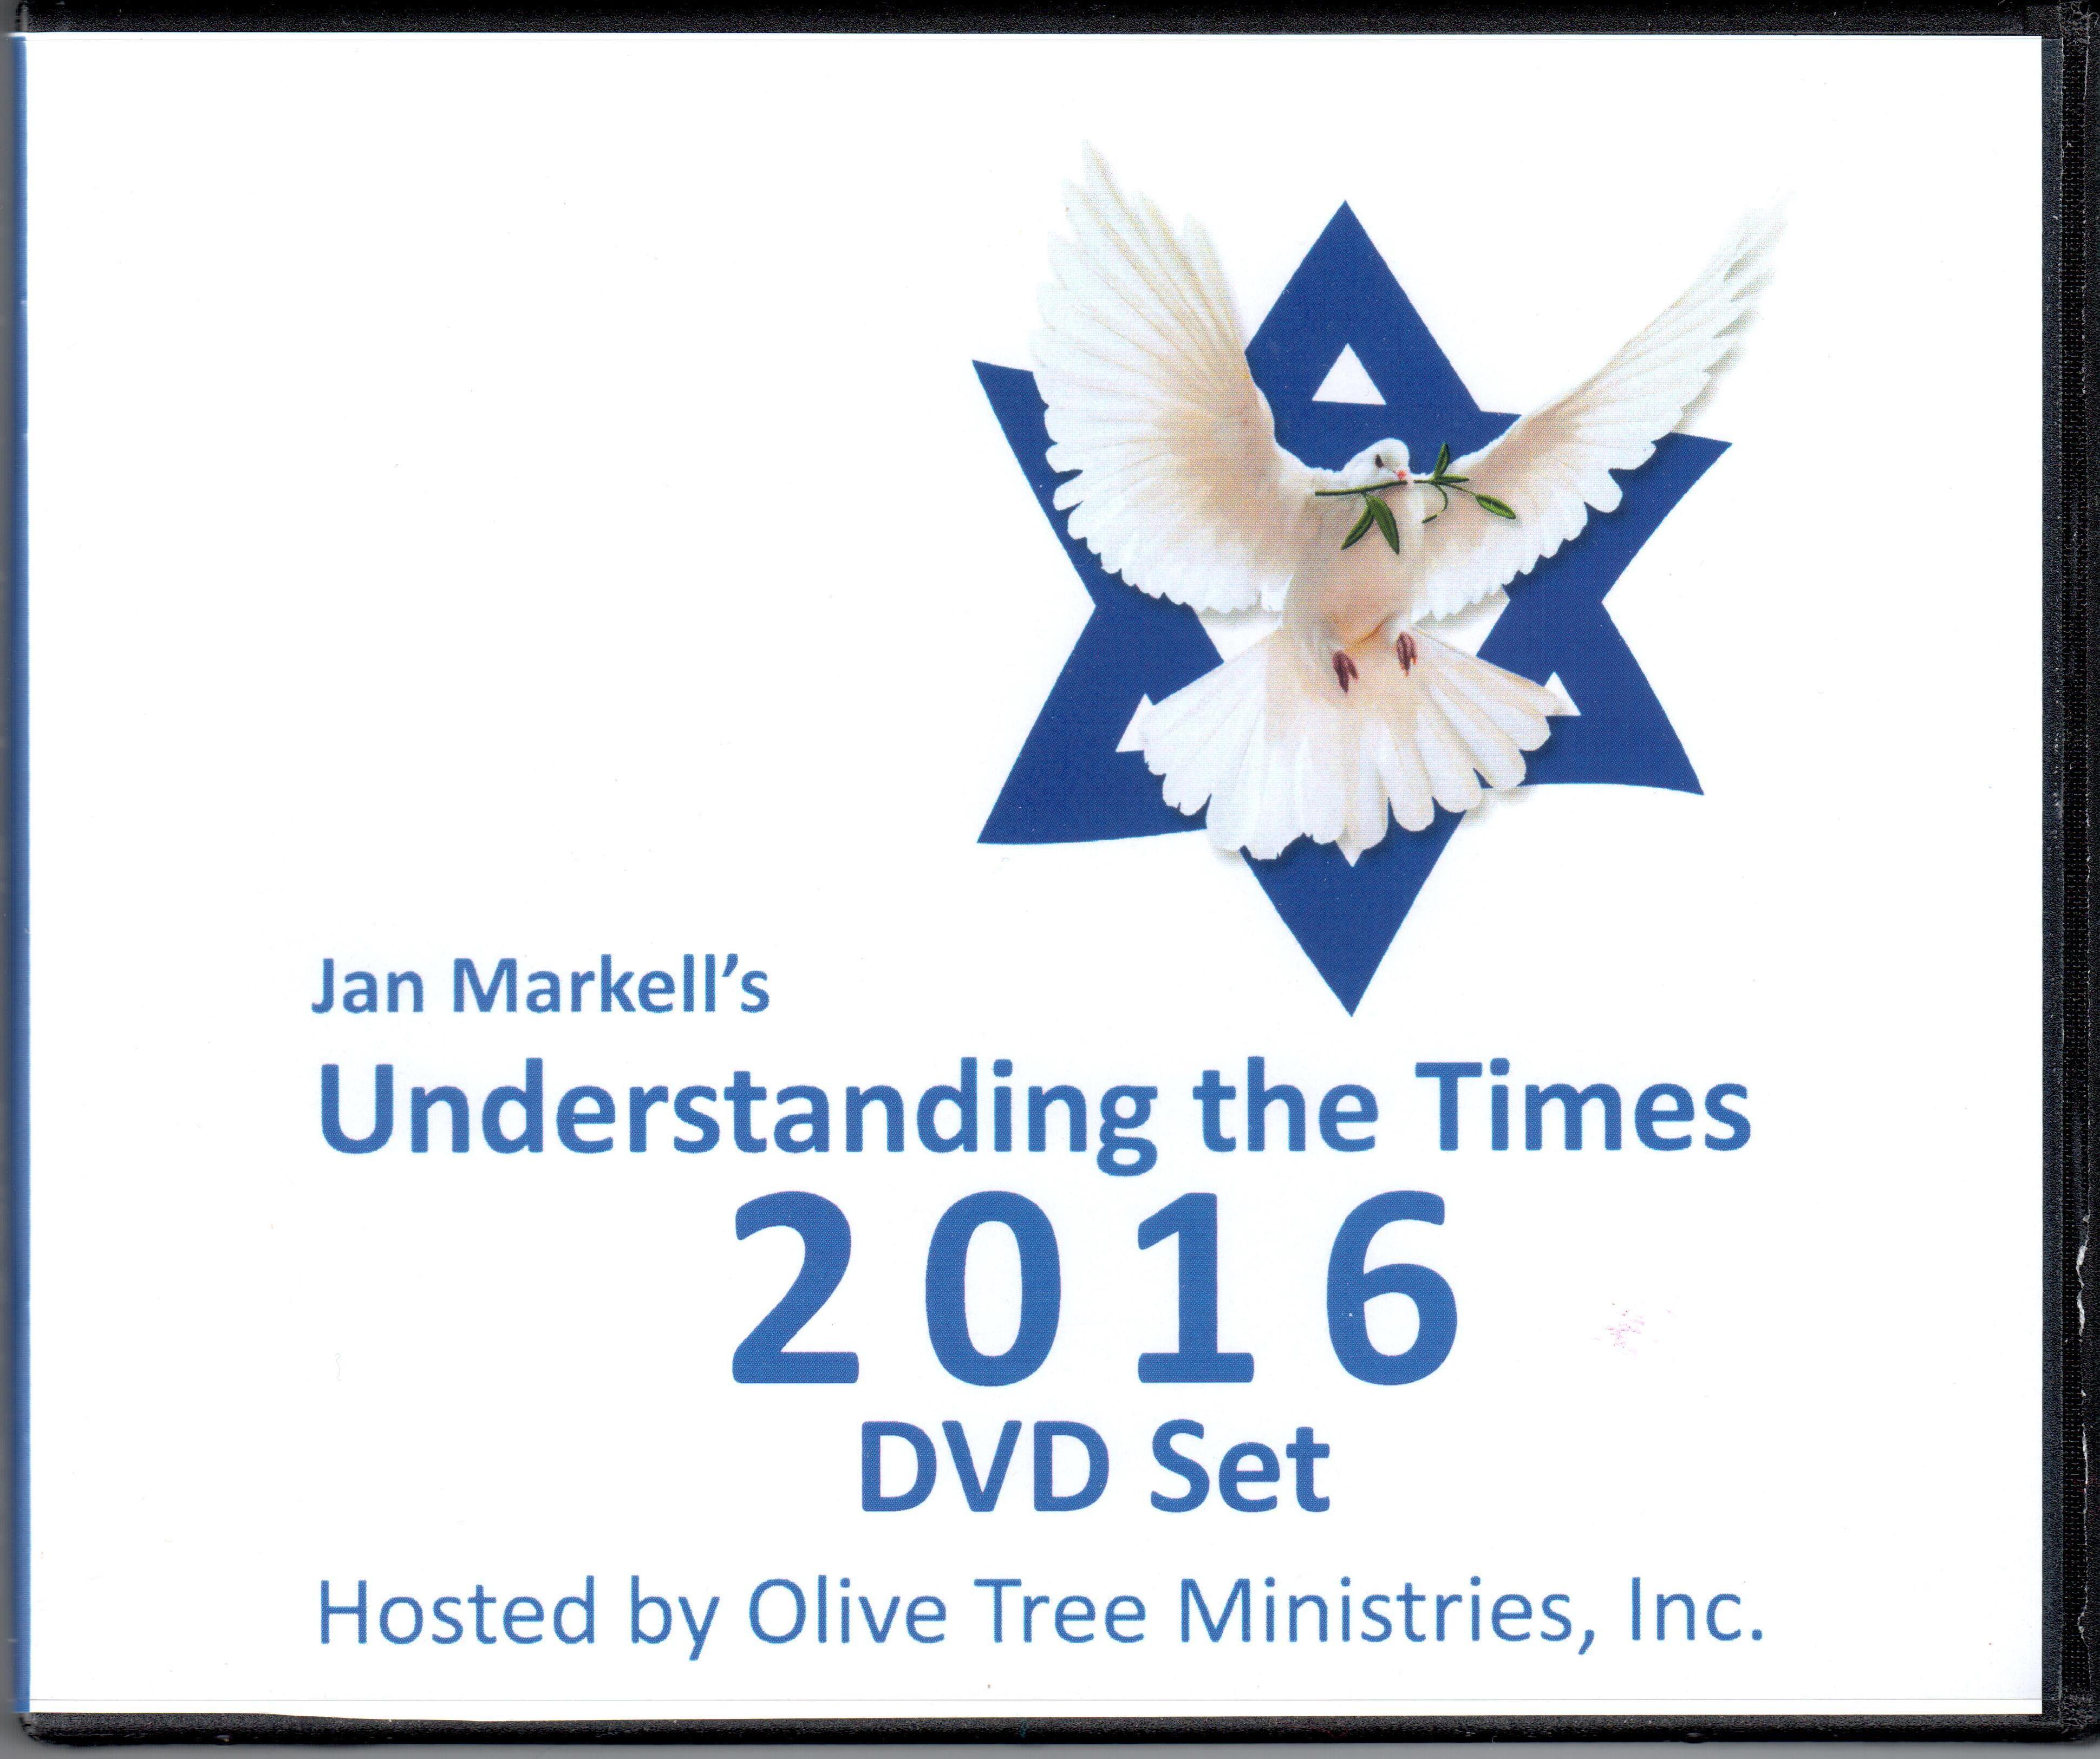 2016 Conference DVDs